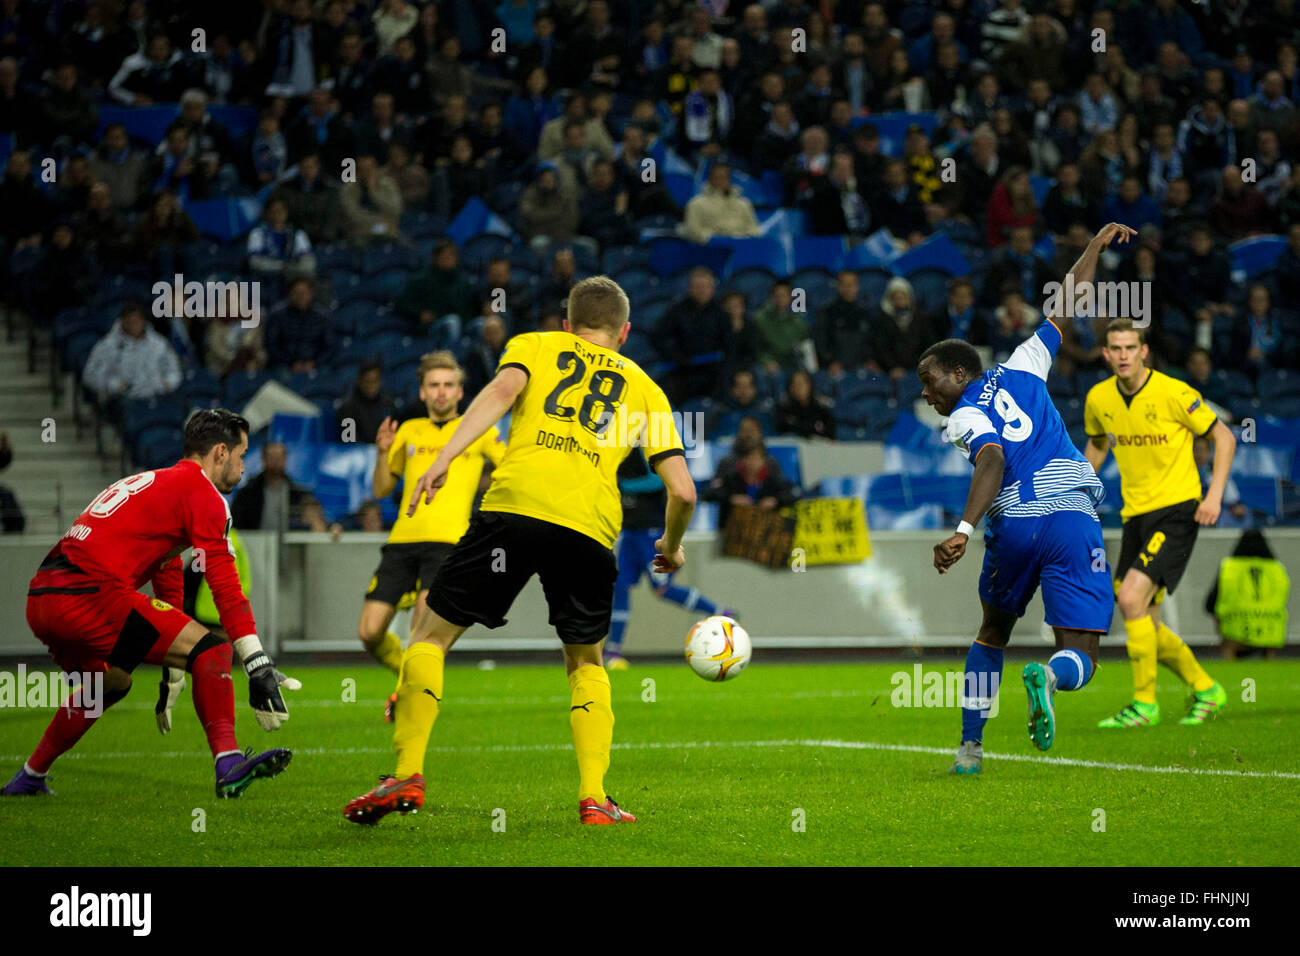 Porto, Portugal. 25th February, 2016. FC Porto's player Aboubakar during UEFA Europa League  2015/16 round 32 - Stock Image